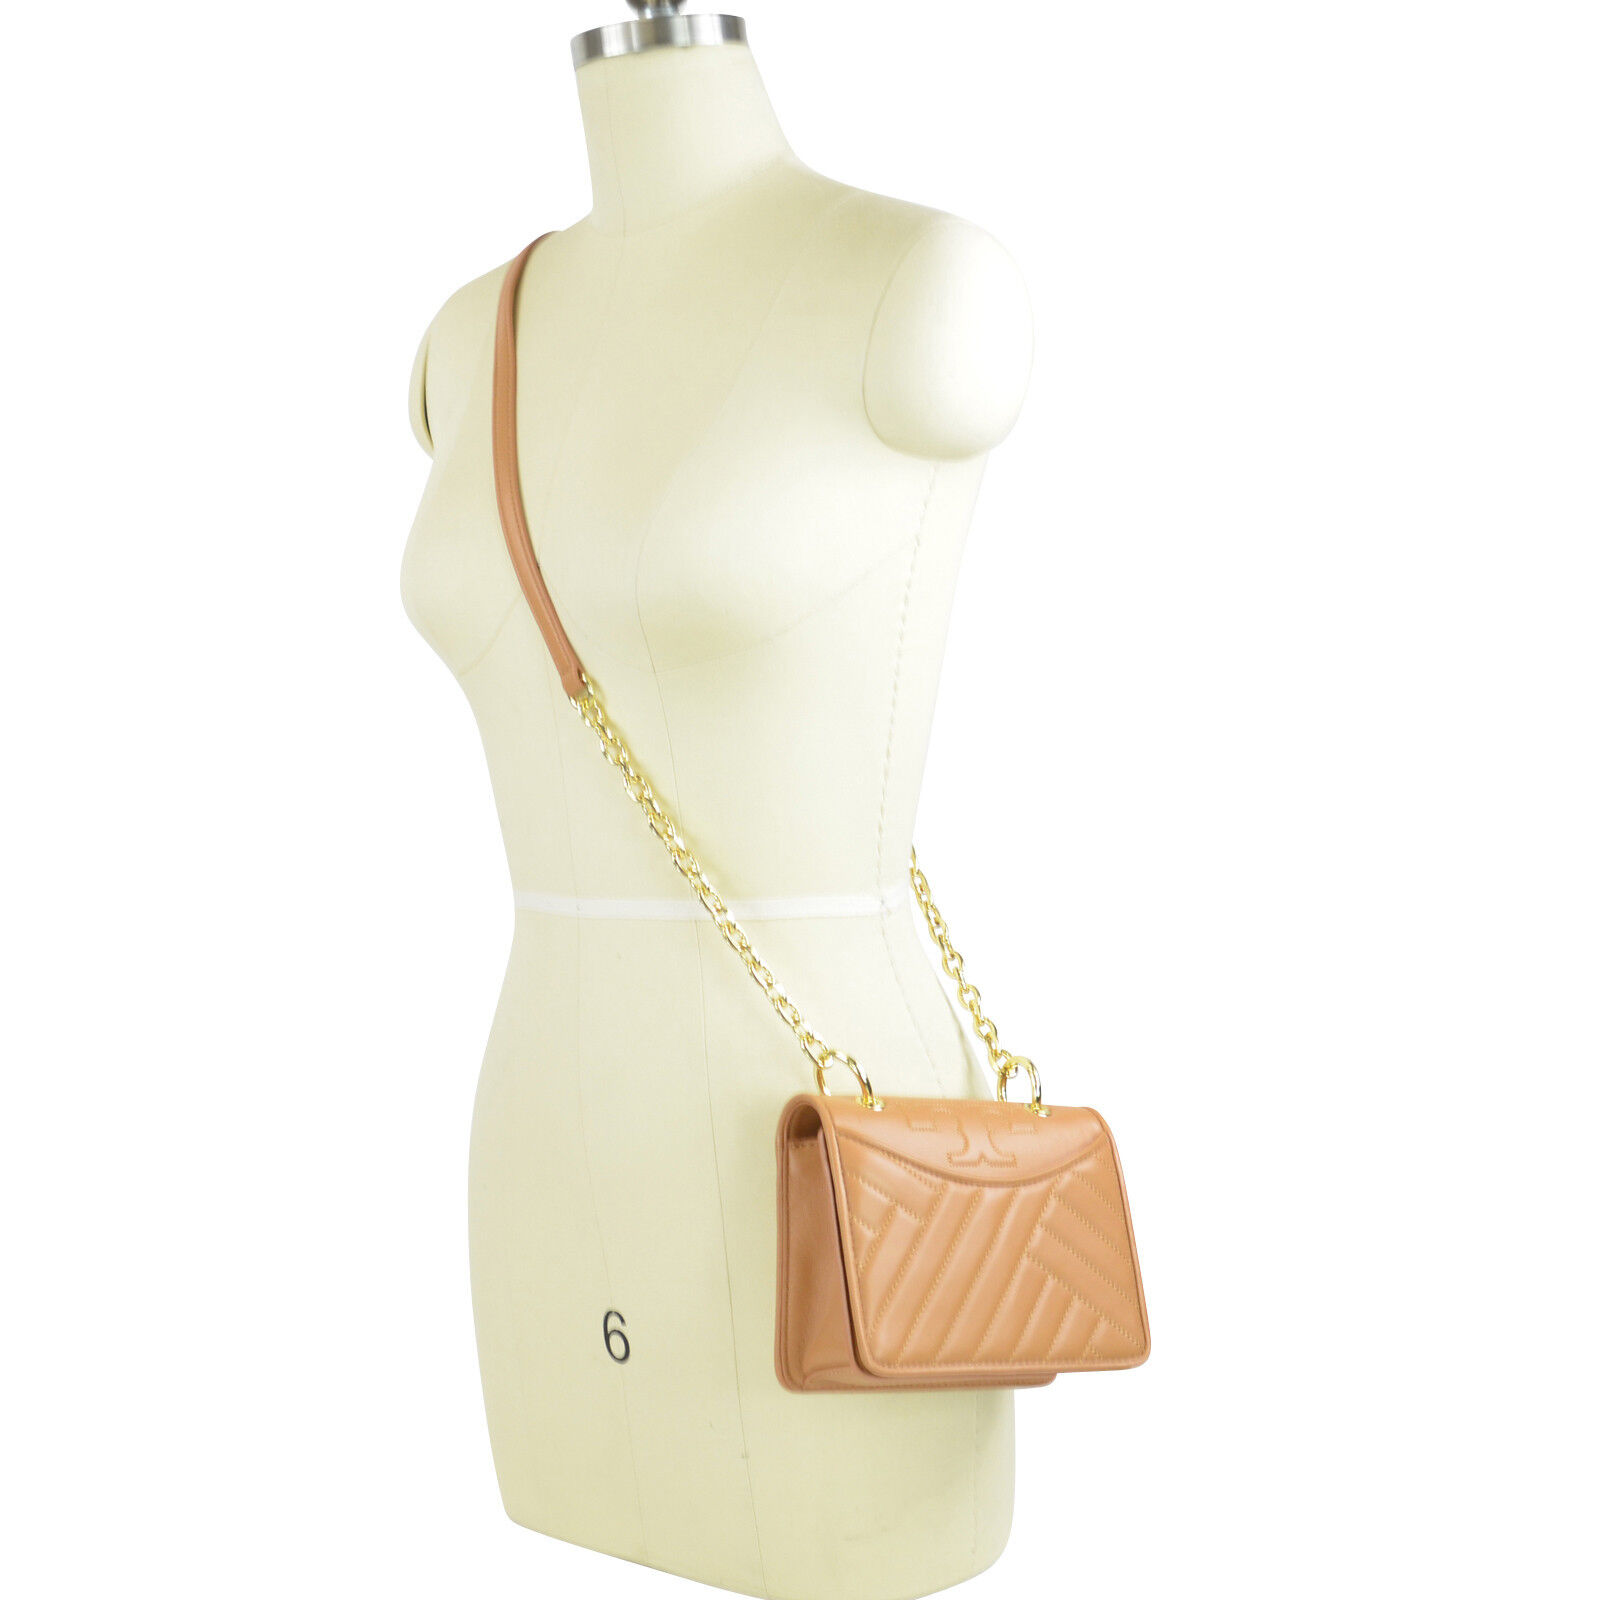 fcb82ea40050 Details about New Tory Burch Alexa Vachetta Tan Shoulder Crossbody Mini Bag   328+gift box